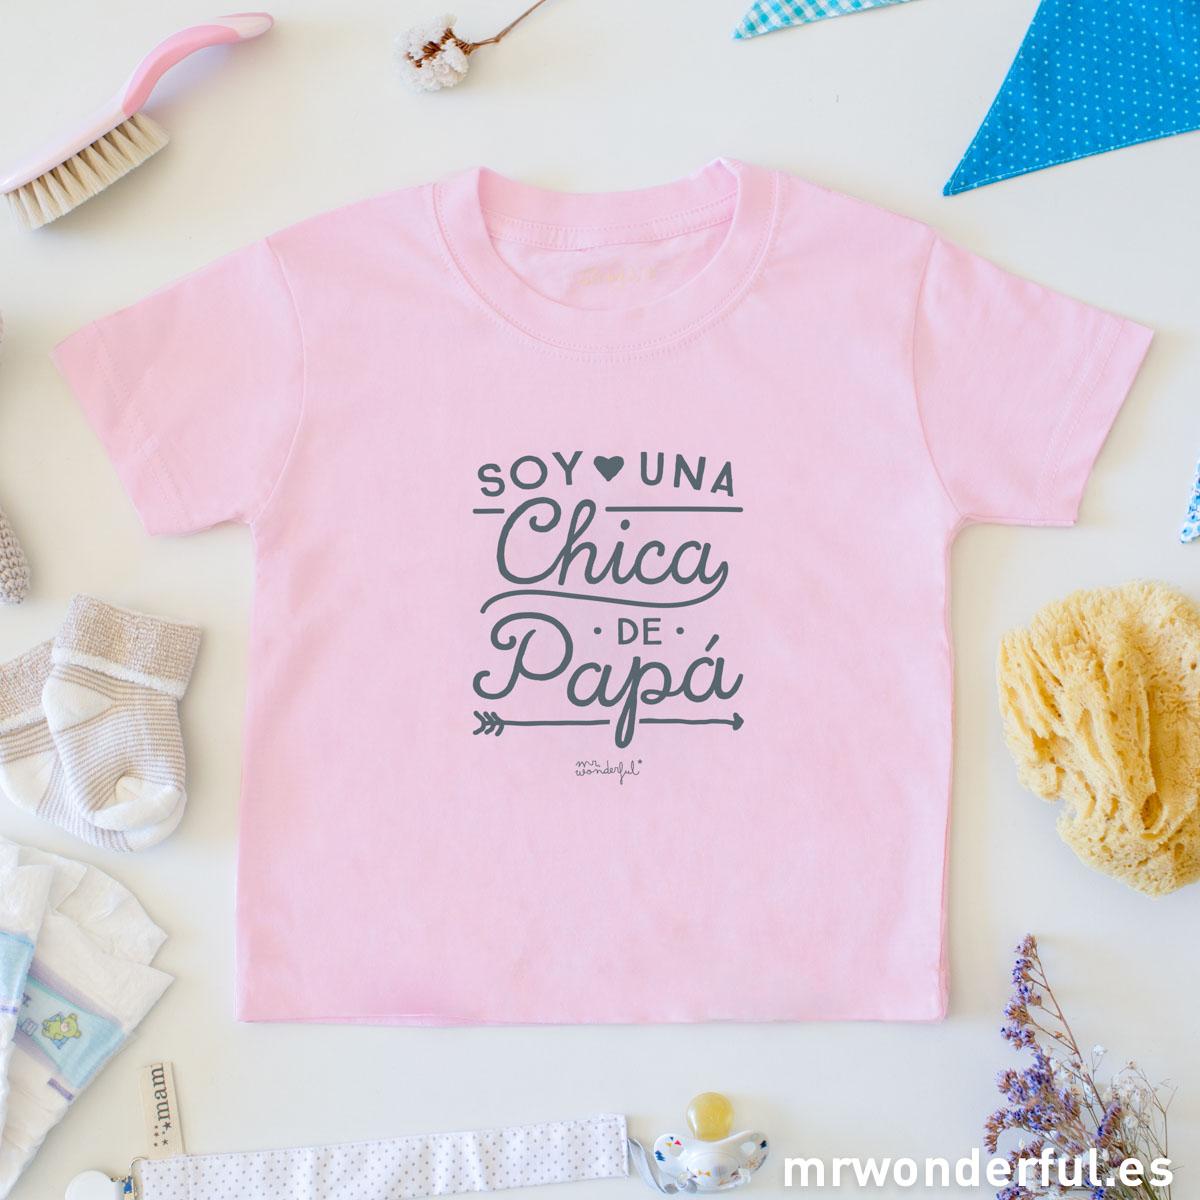 mrwonderful_8436547191031_CAMIS_004_Camiseta-nino-Soy-una-chica-de-papa-11-Editar-Editar